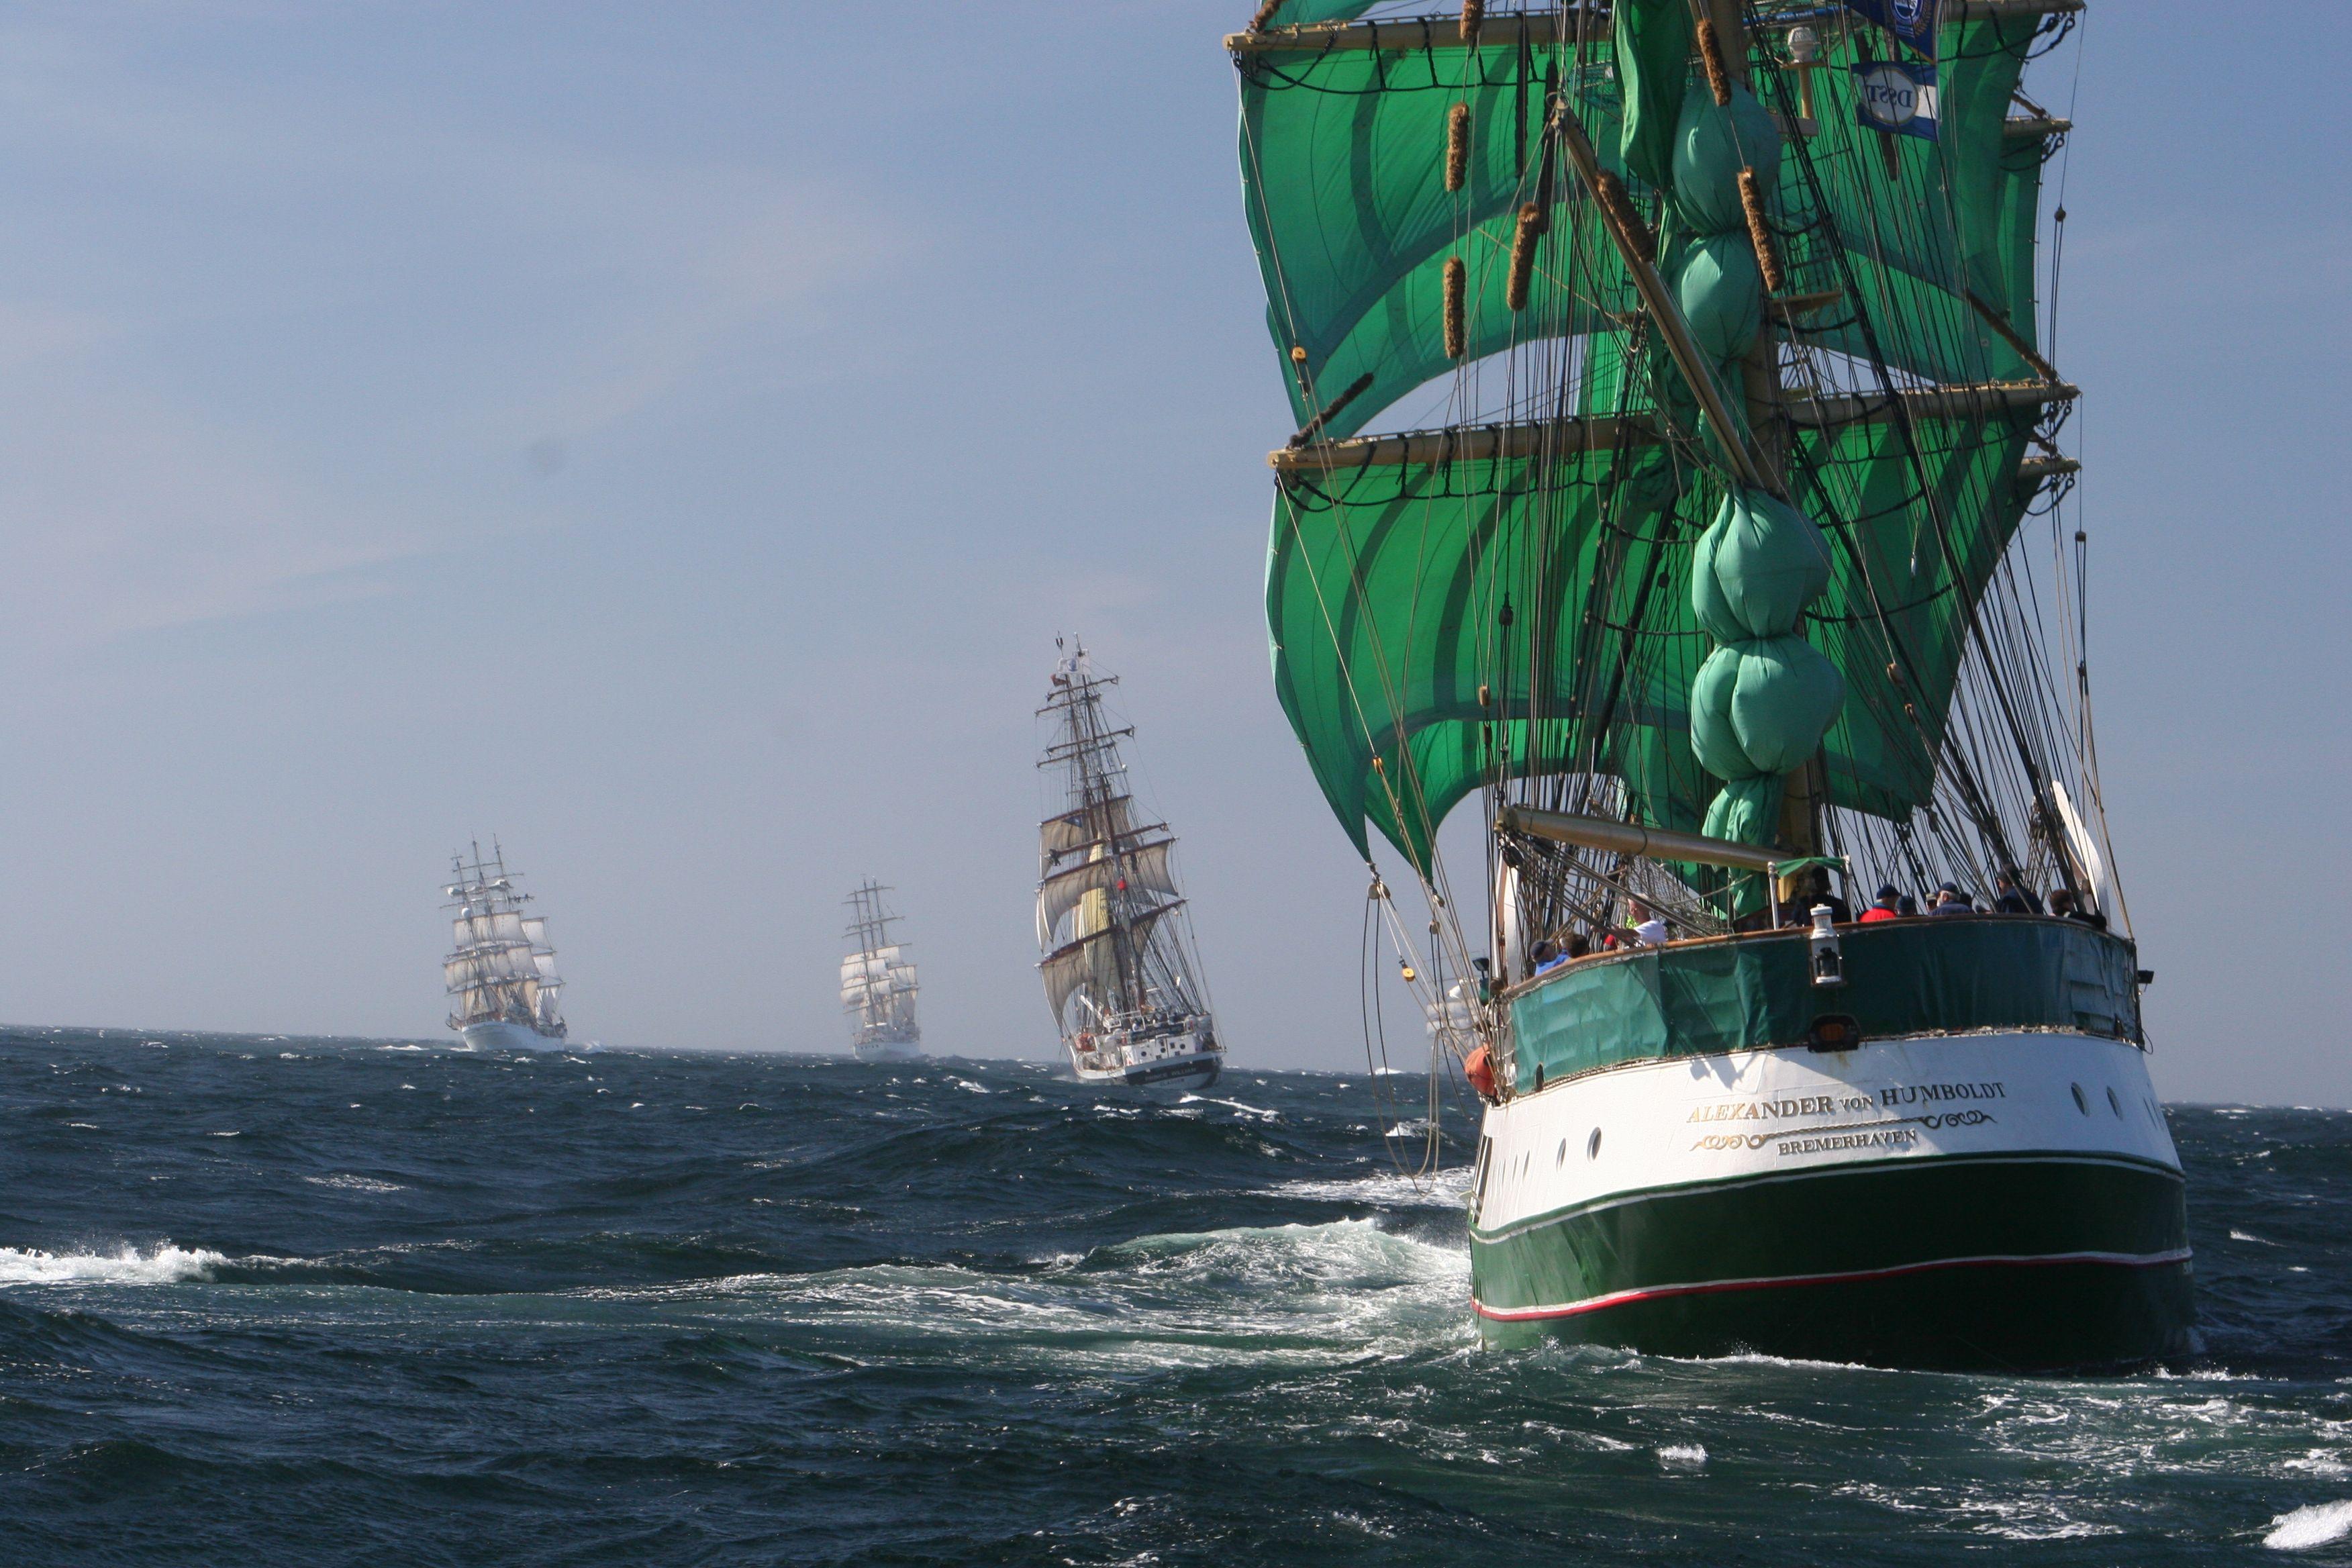 Csg 005 Alexander Von Humbolt Tall Ships Race Tall Ships Sailing